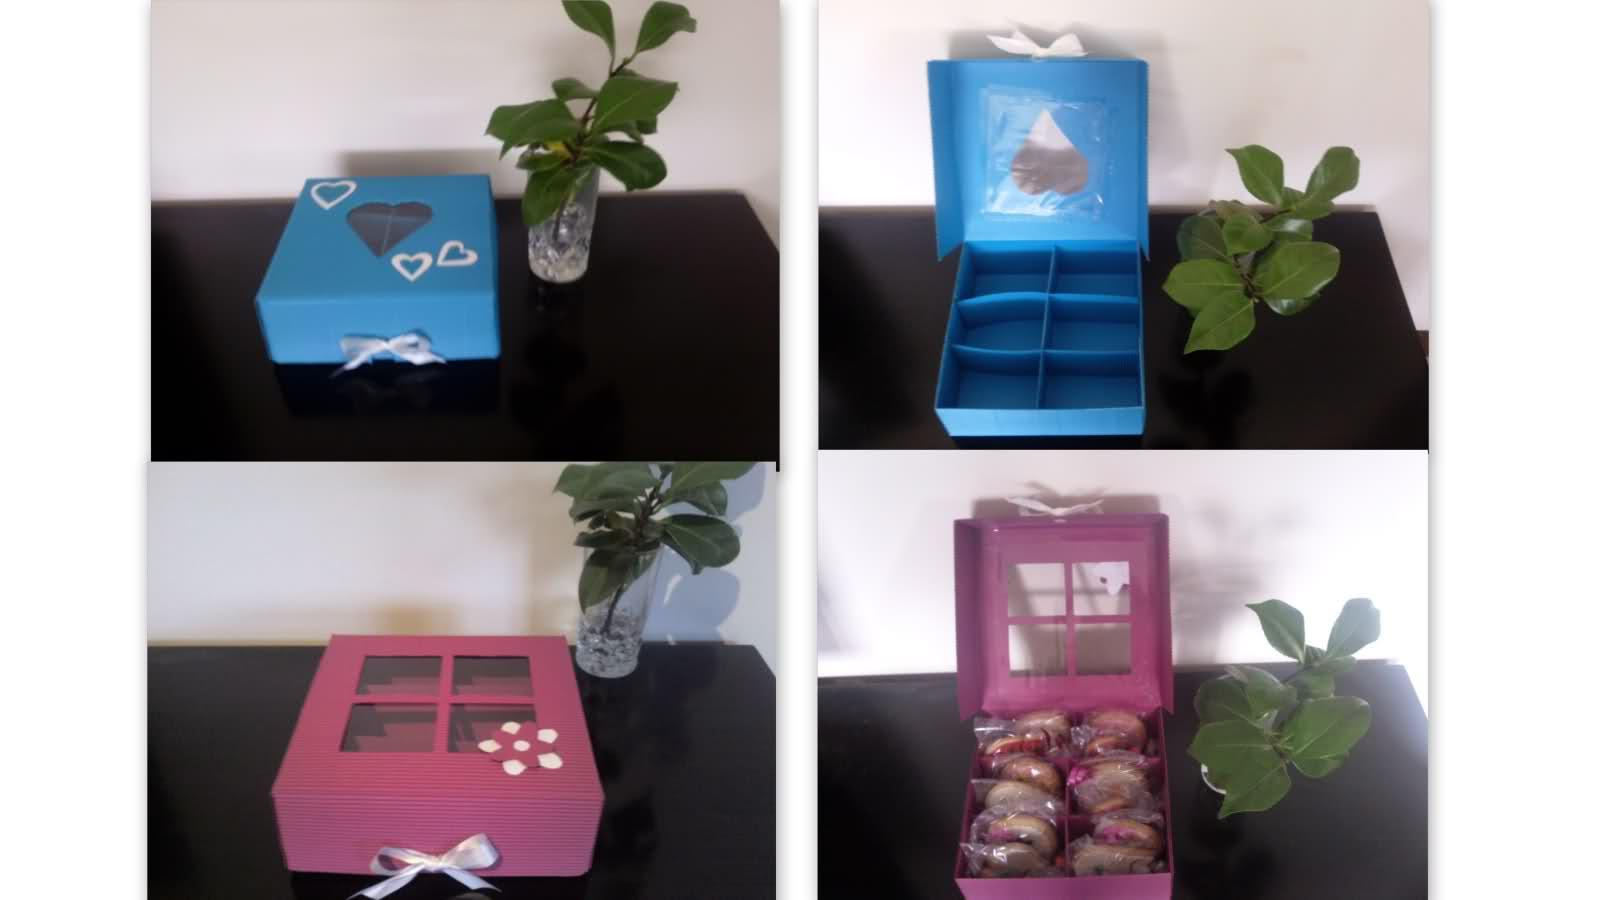 Cajas para cupcakes - Página 3 Fn622x